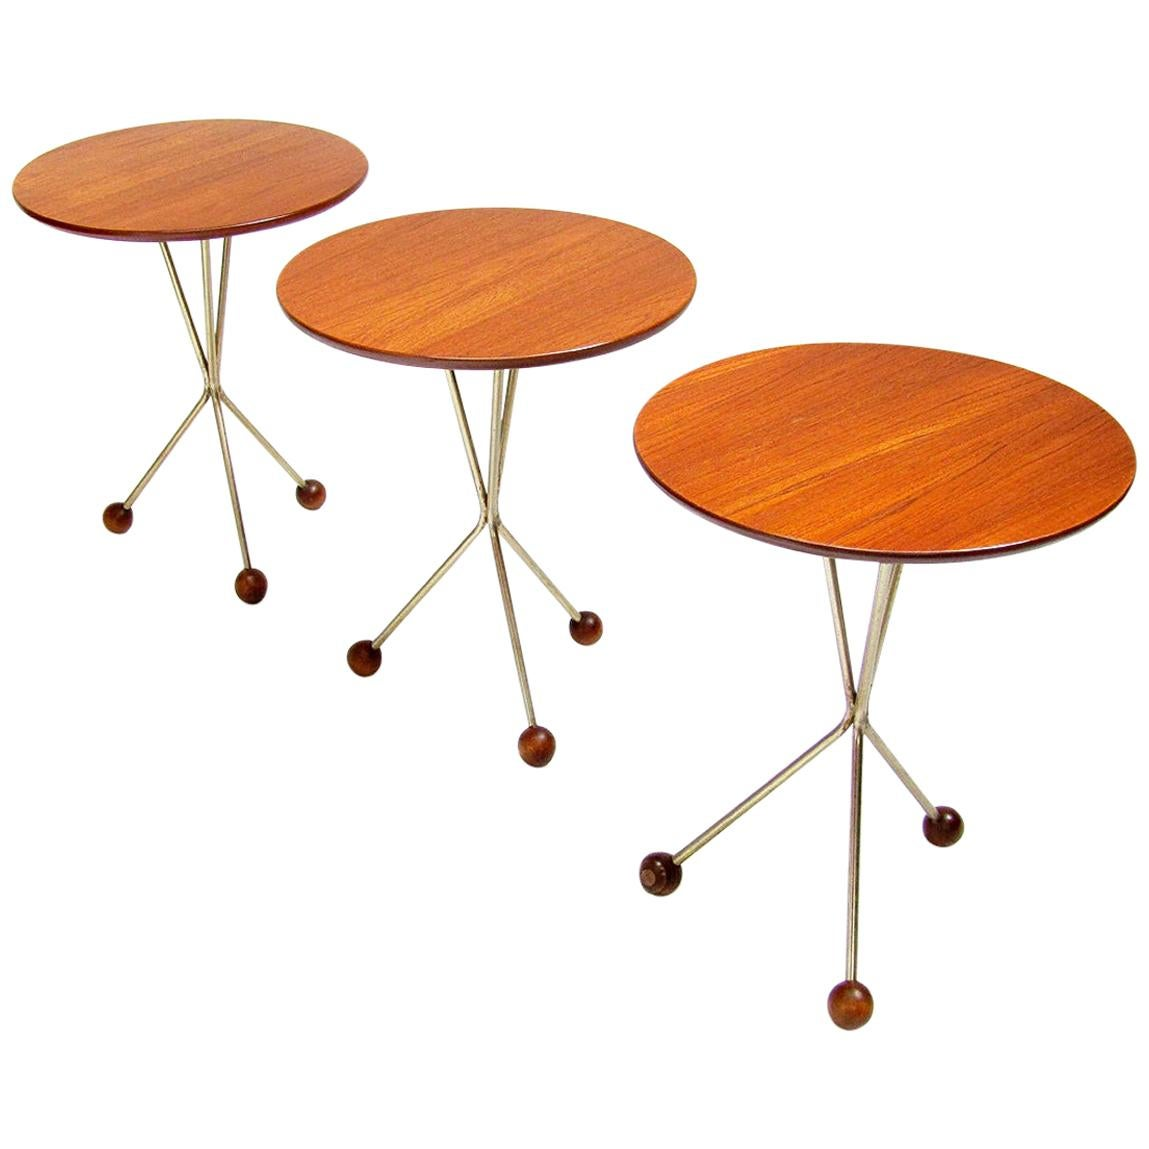 Three 1950s Swedish Round Atomic Side Tables in Teak & Brass by Albert Larsson